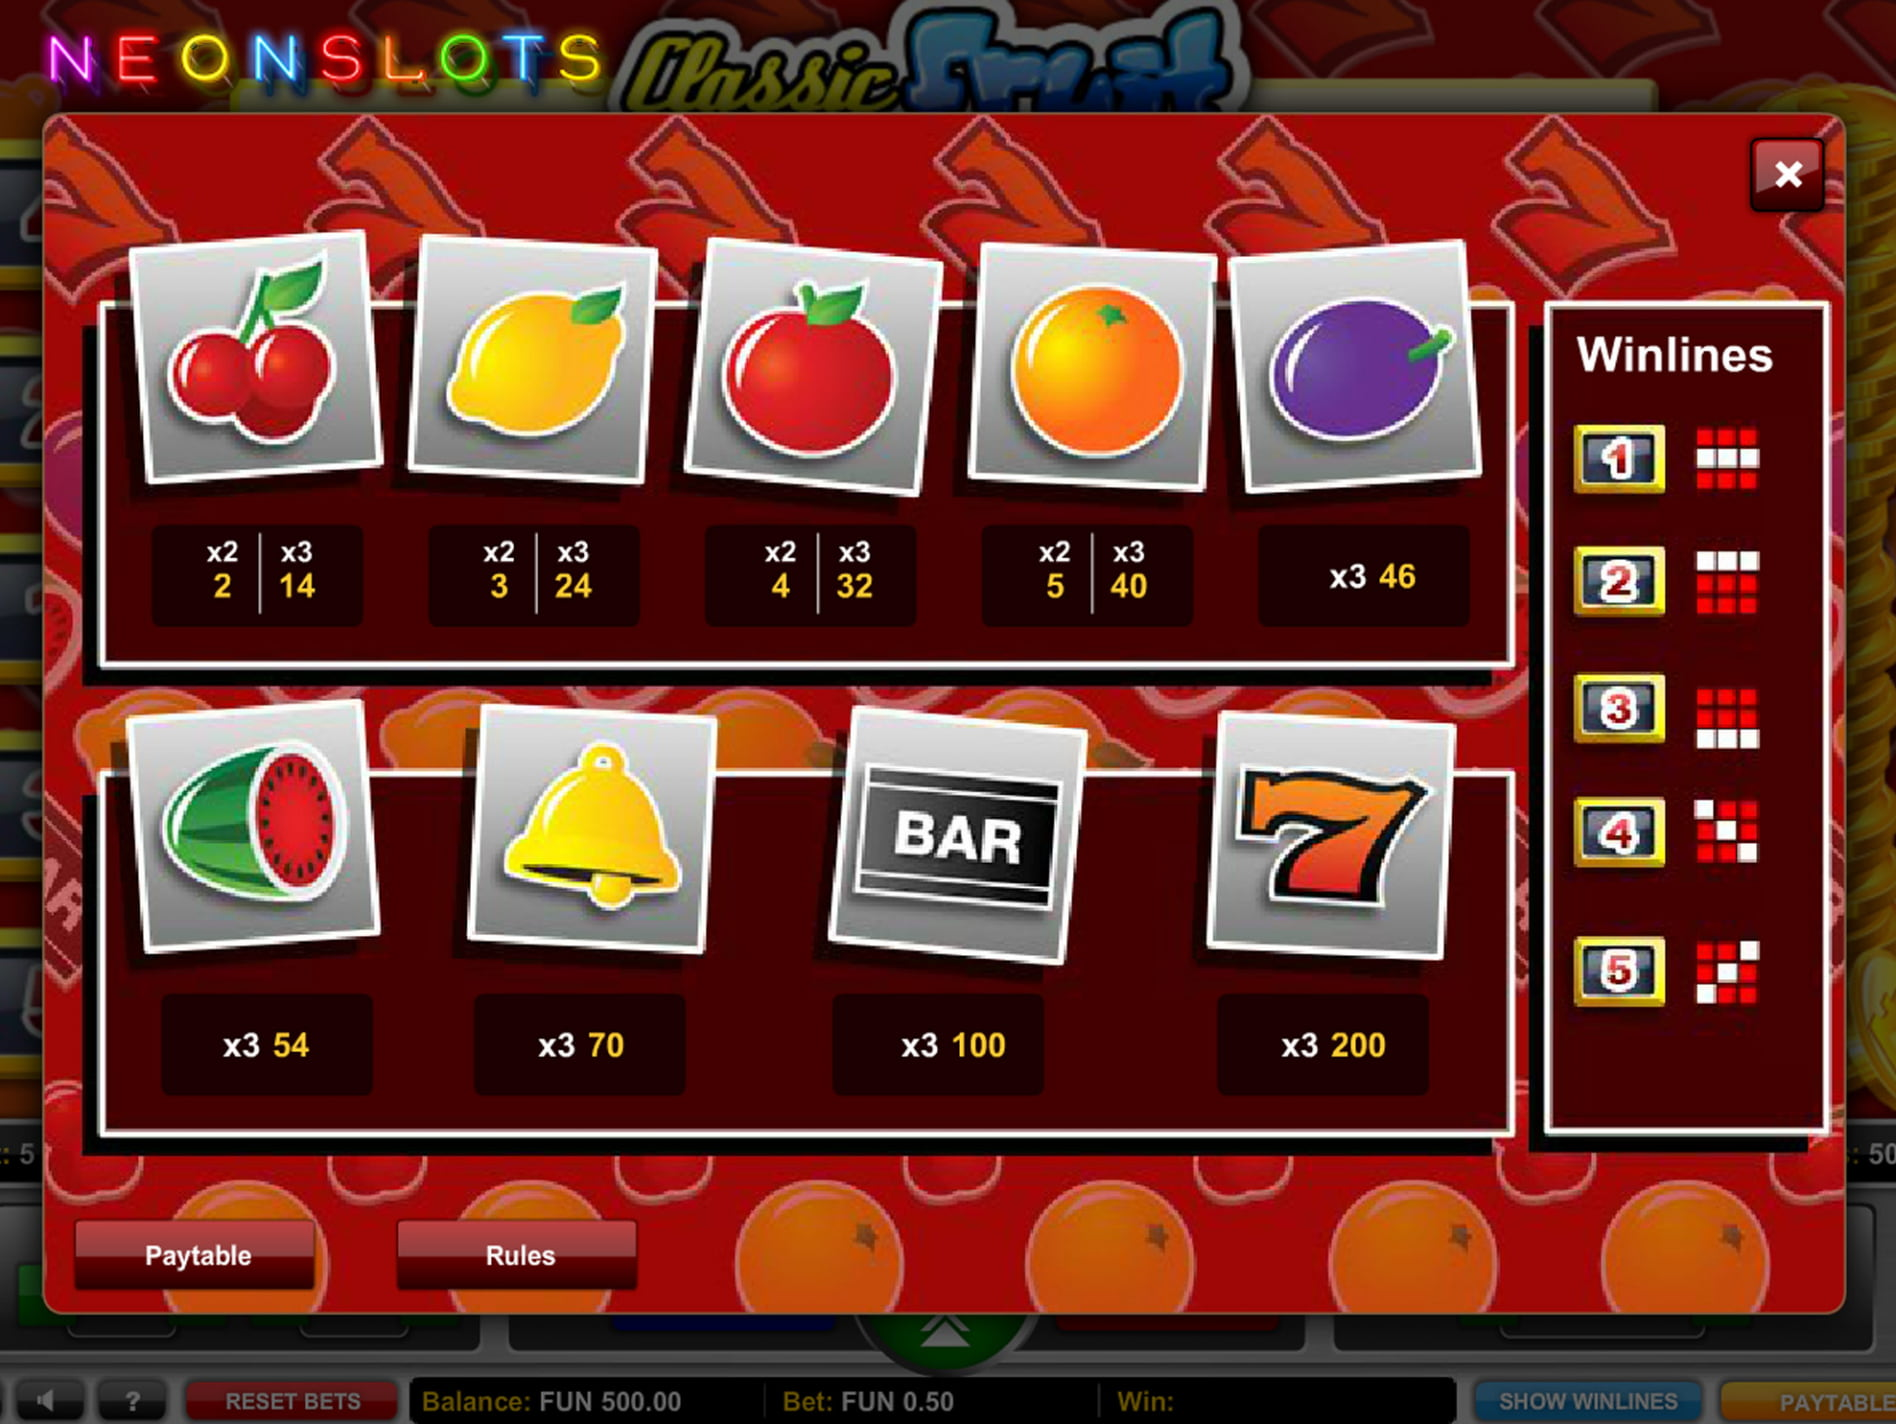 Tabla de ruleta casino online legales en Juárez-751466